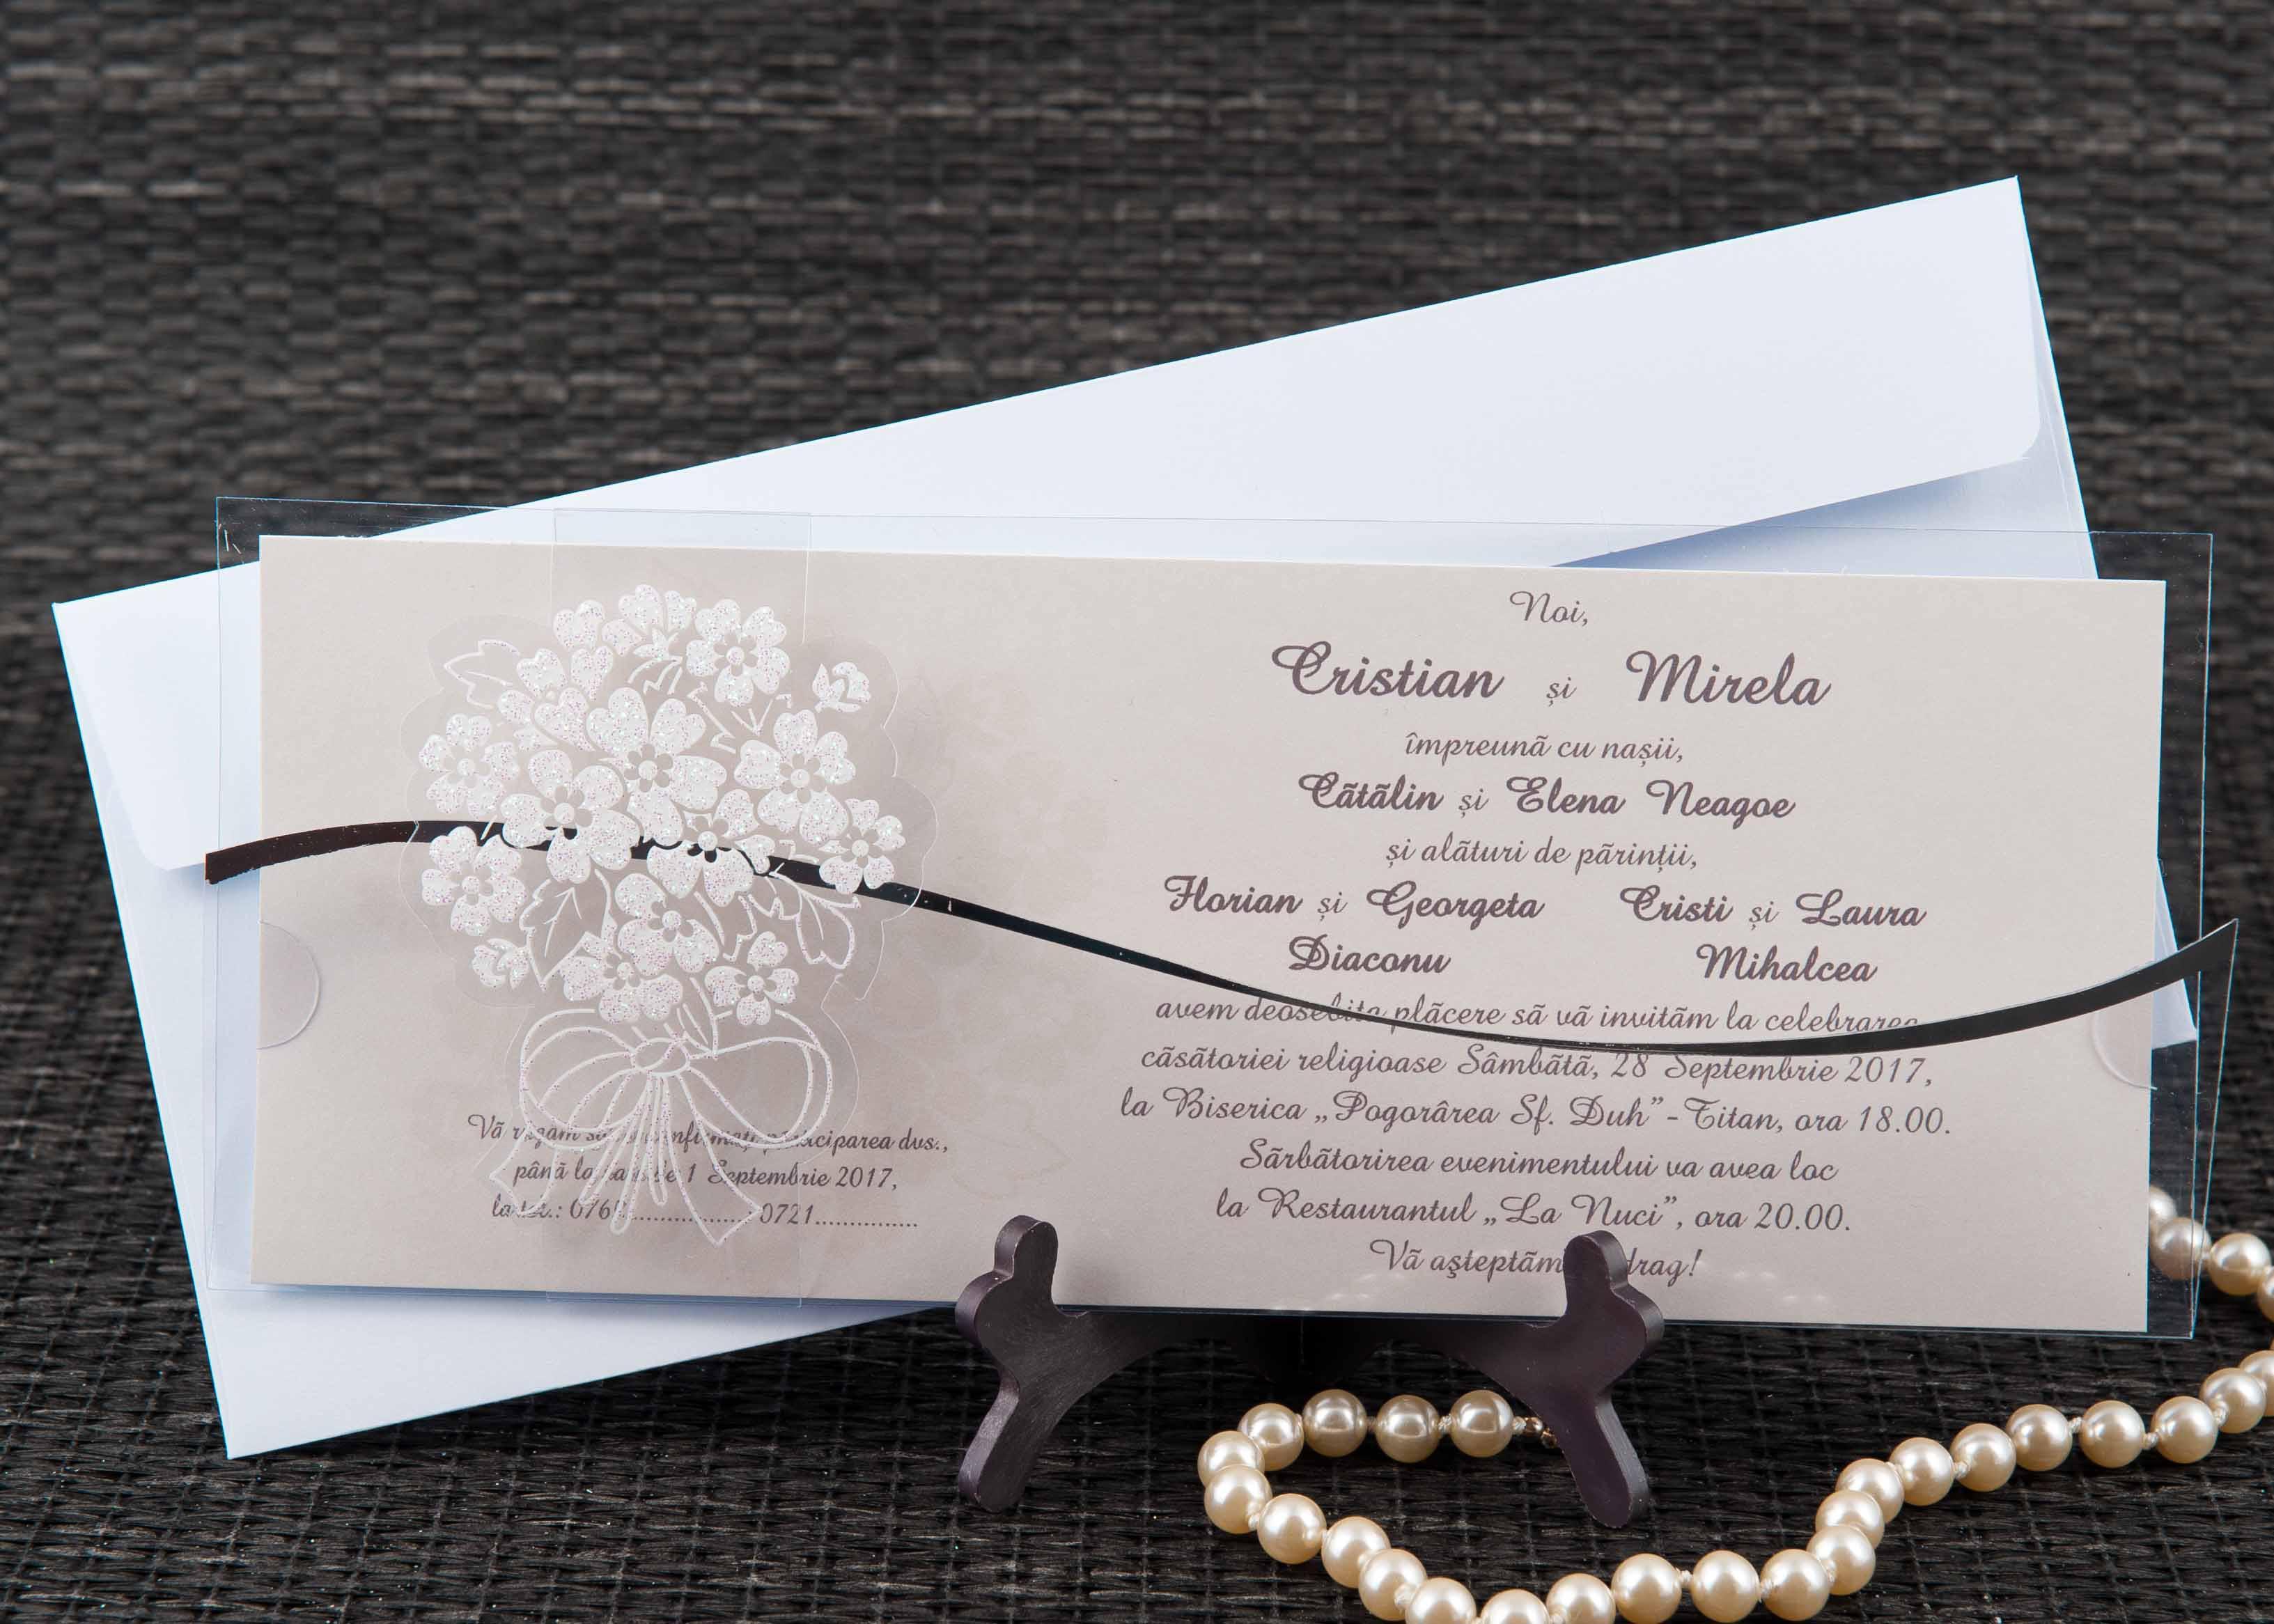 20466 Stoc Limitat Invitatii Nunta Invitatii Botez Marturii